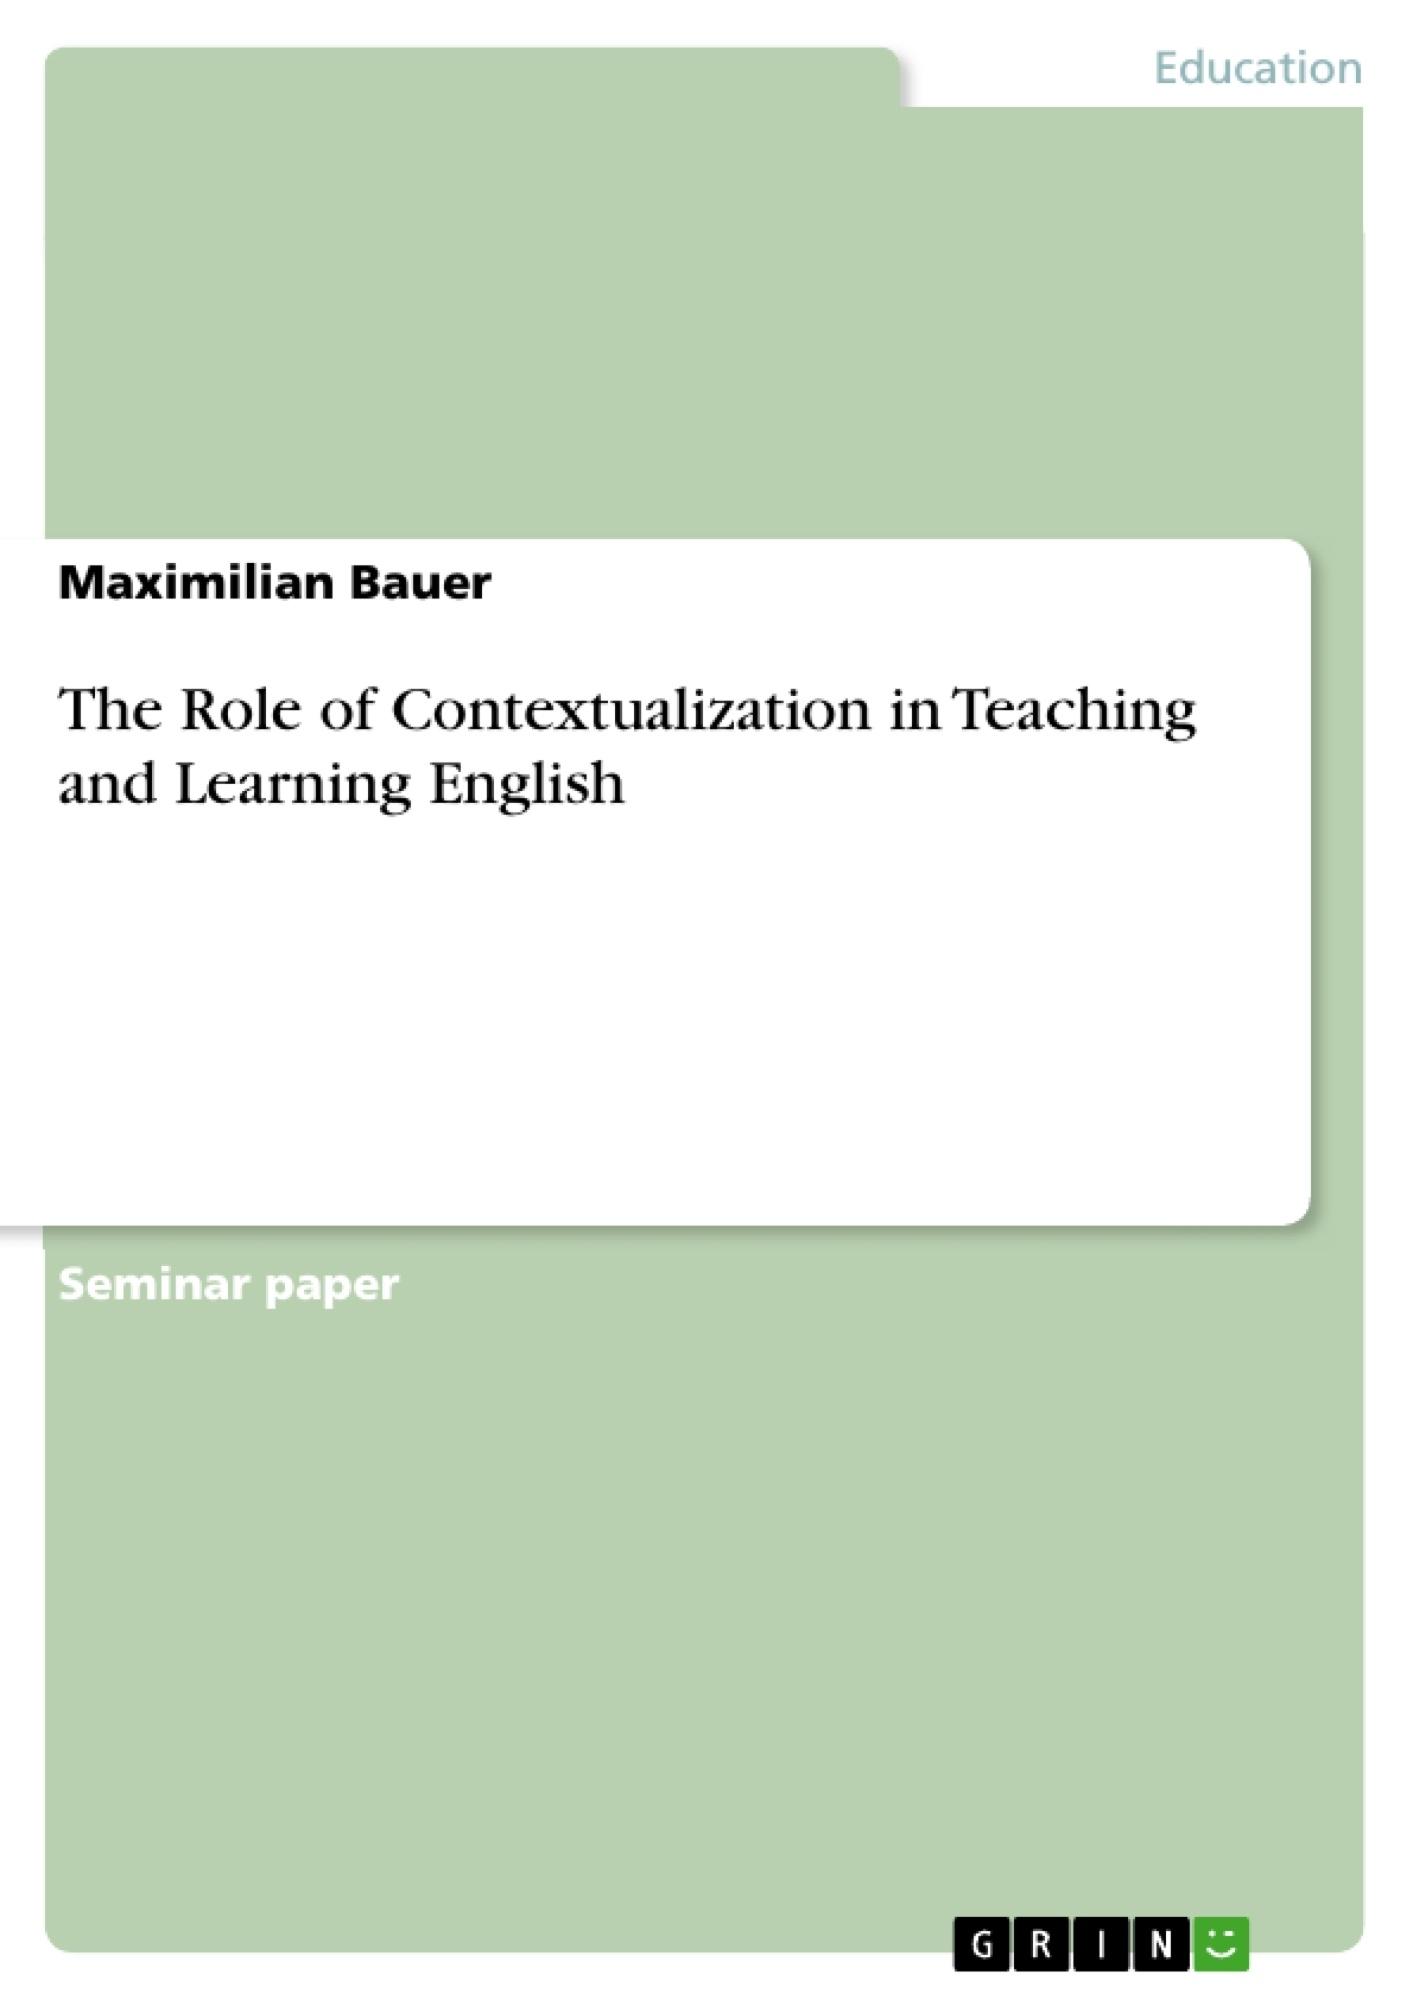 ma thesis in teaching english